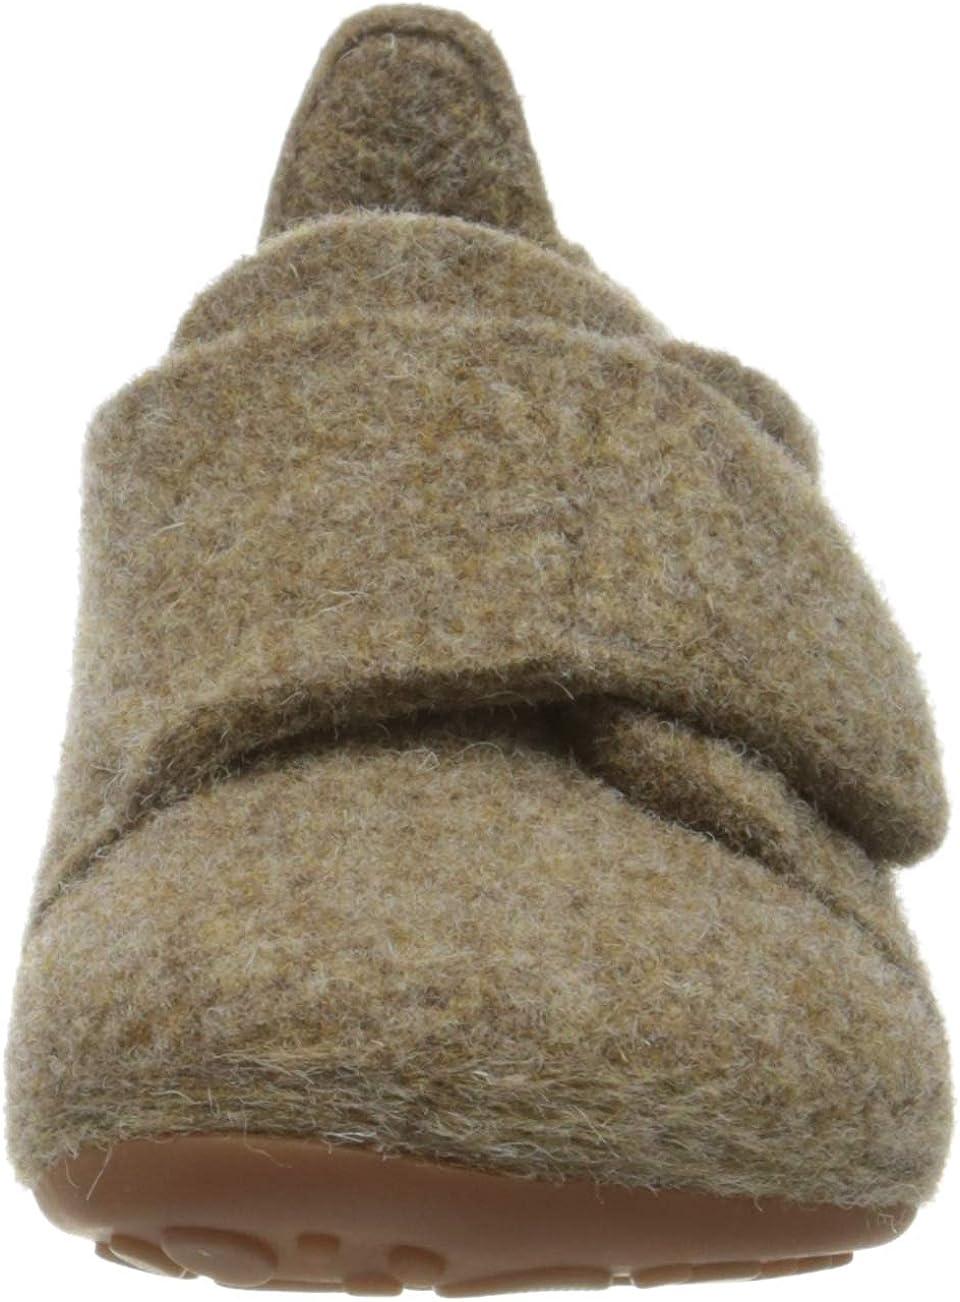 Bisgaard Unisex-Kinder Wool Niedrige Hausschuhe